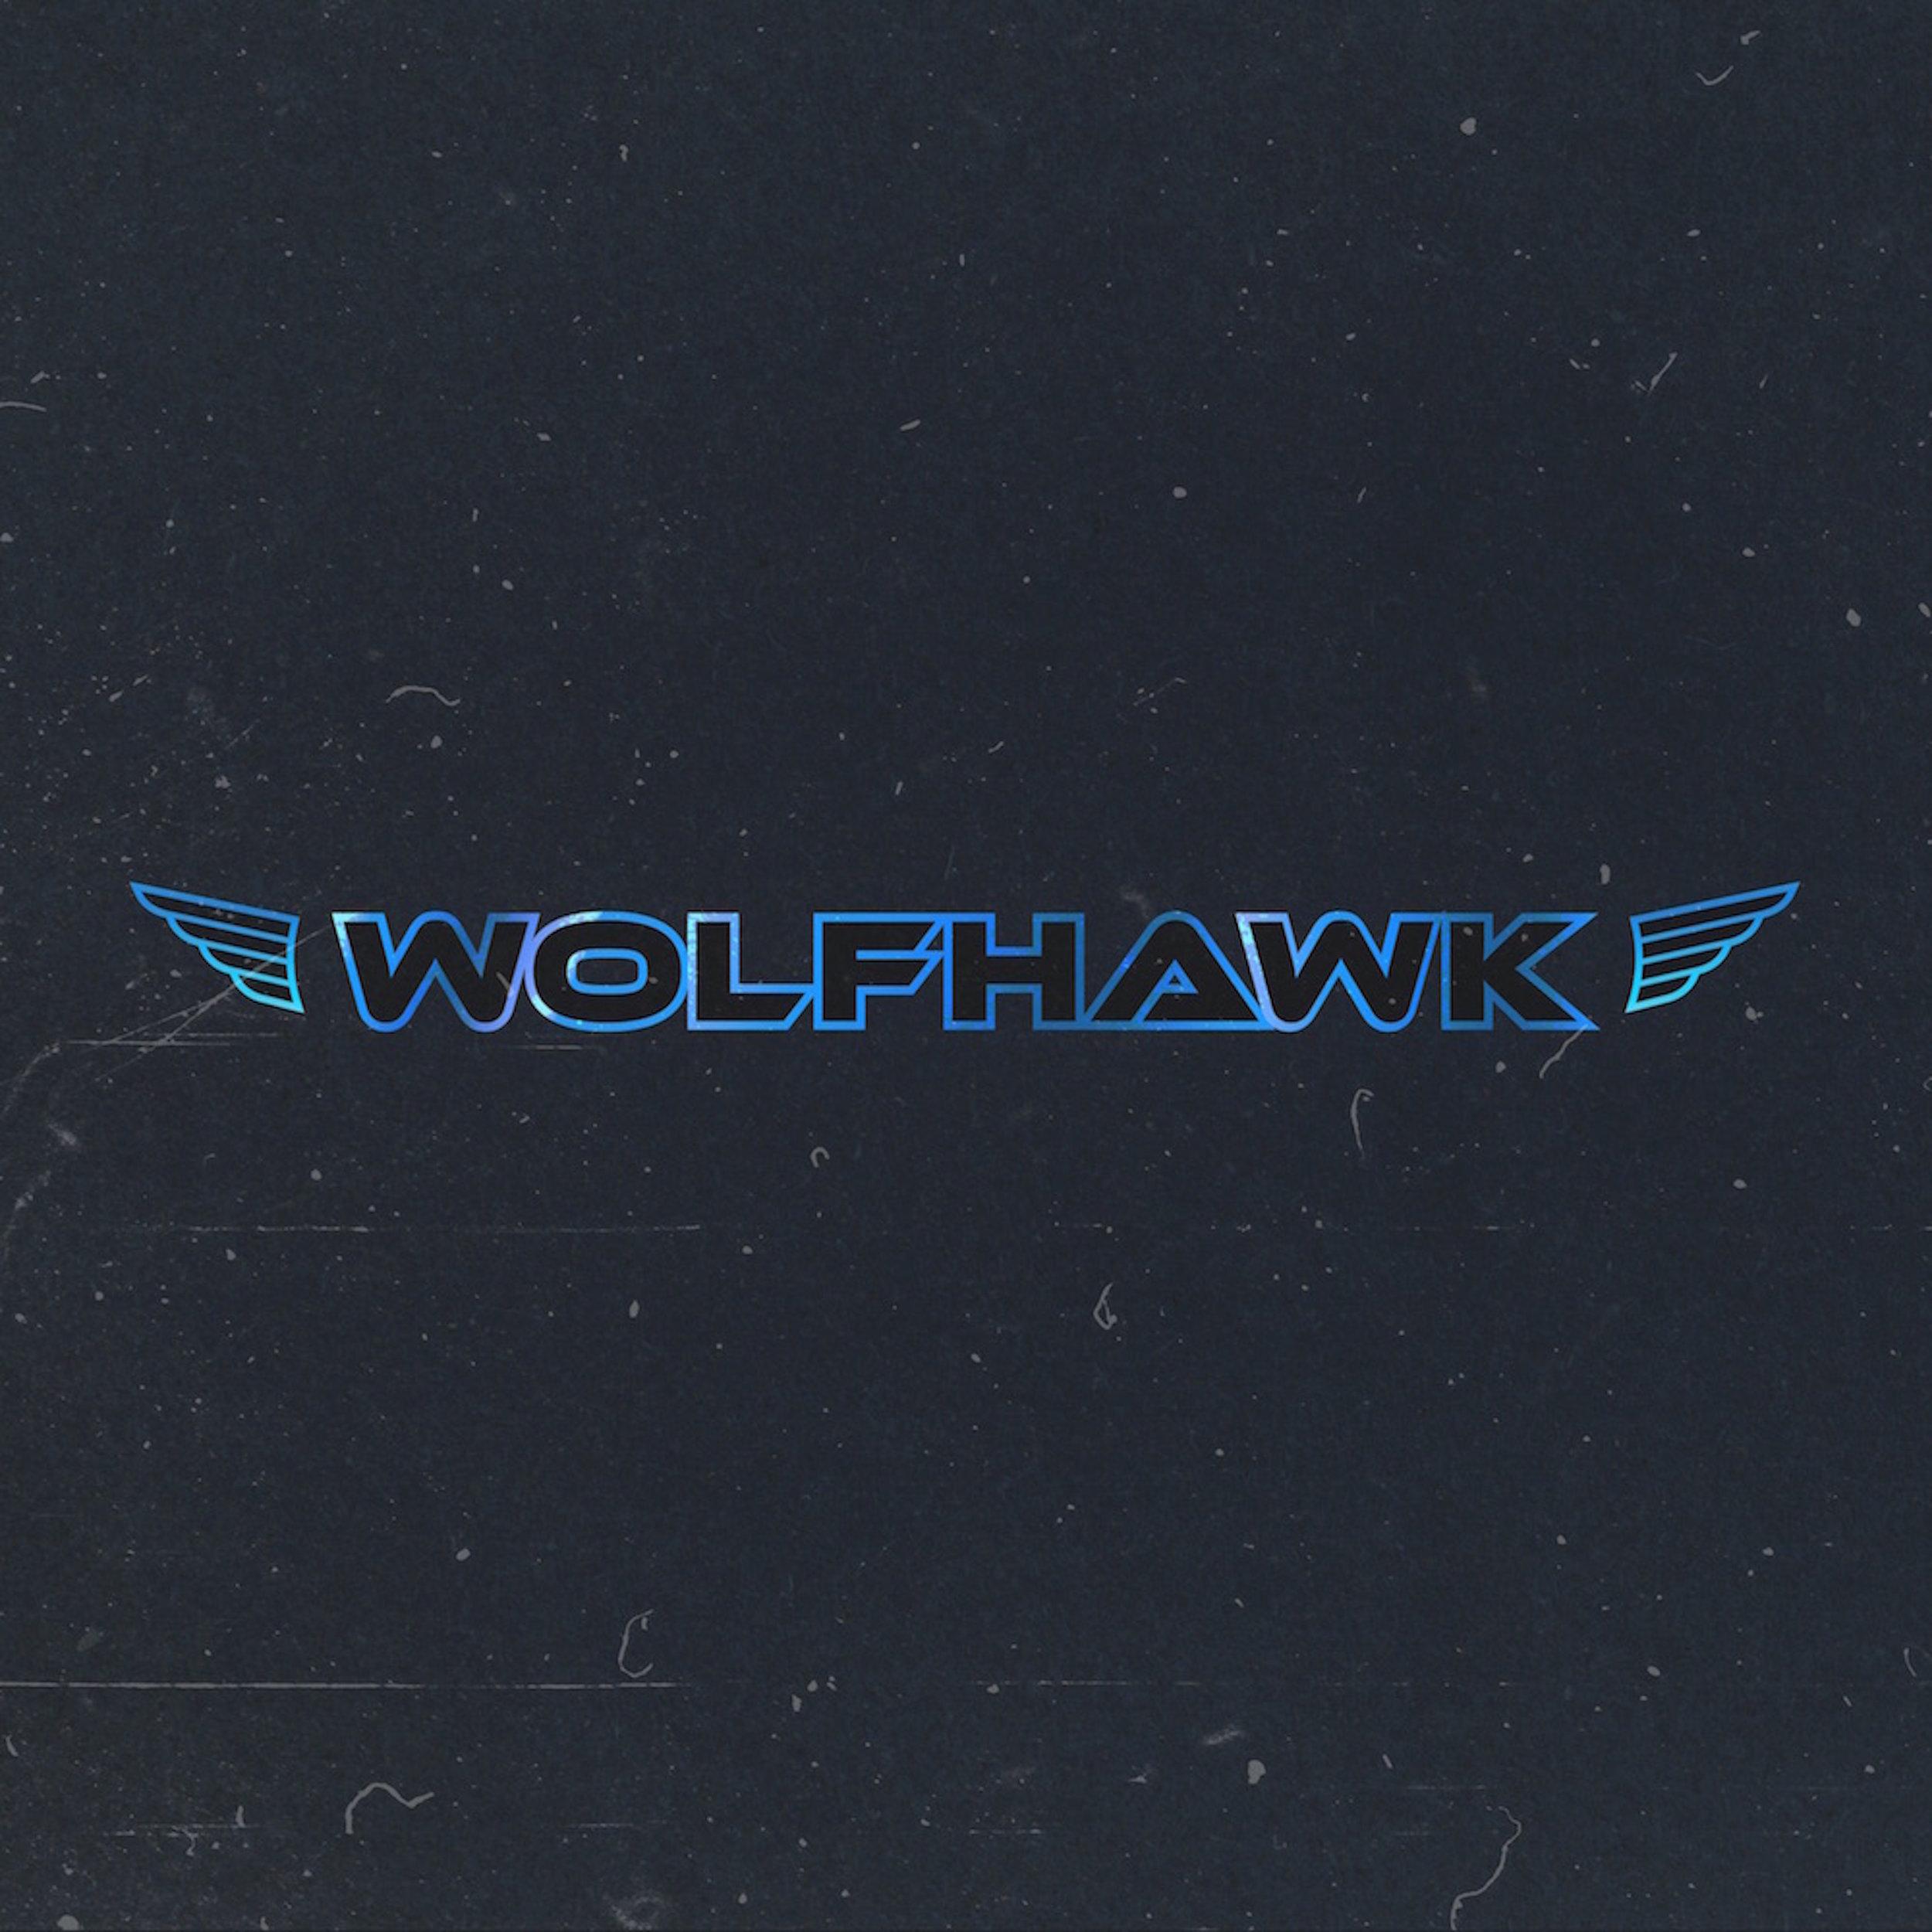 WOLFHAWK EP - FEBRUARY 2019